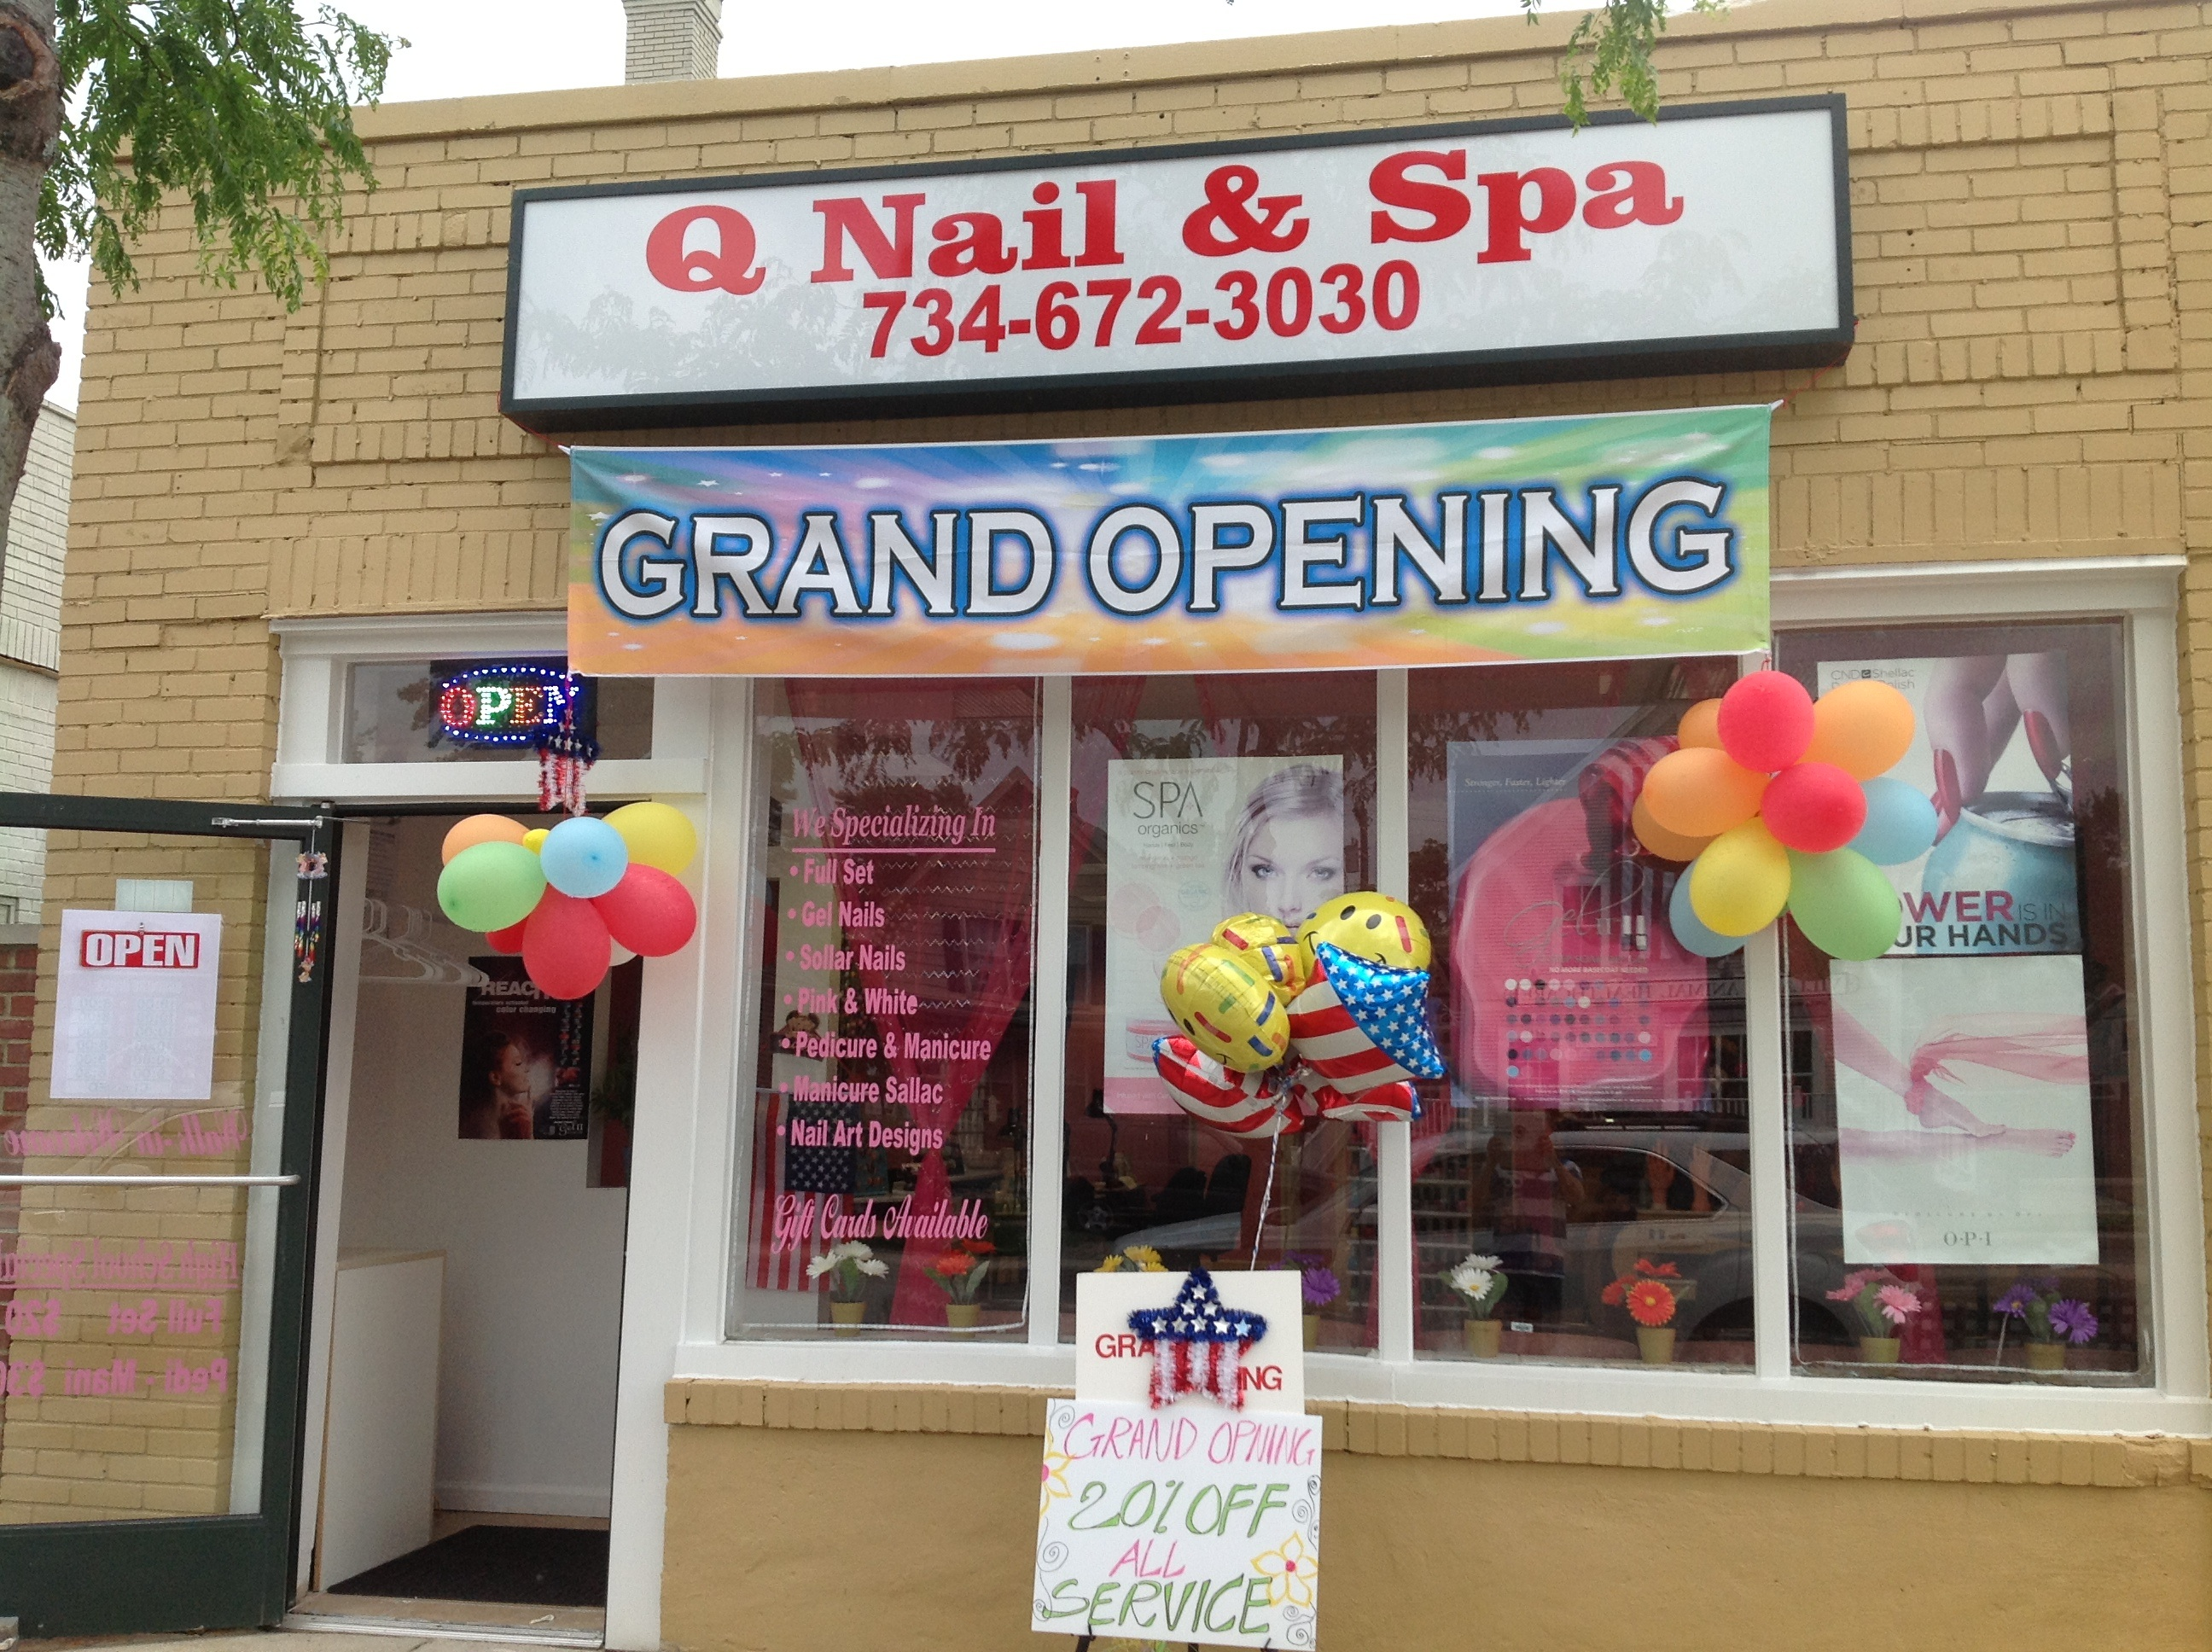 Q Nails & Spa 2455 W Jefferson ave, Trenton, MI 48183 - YP.com